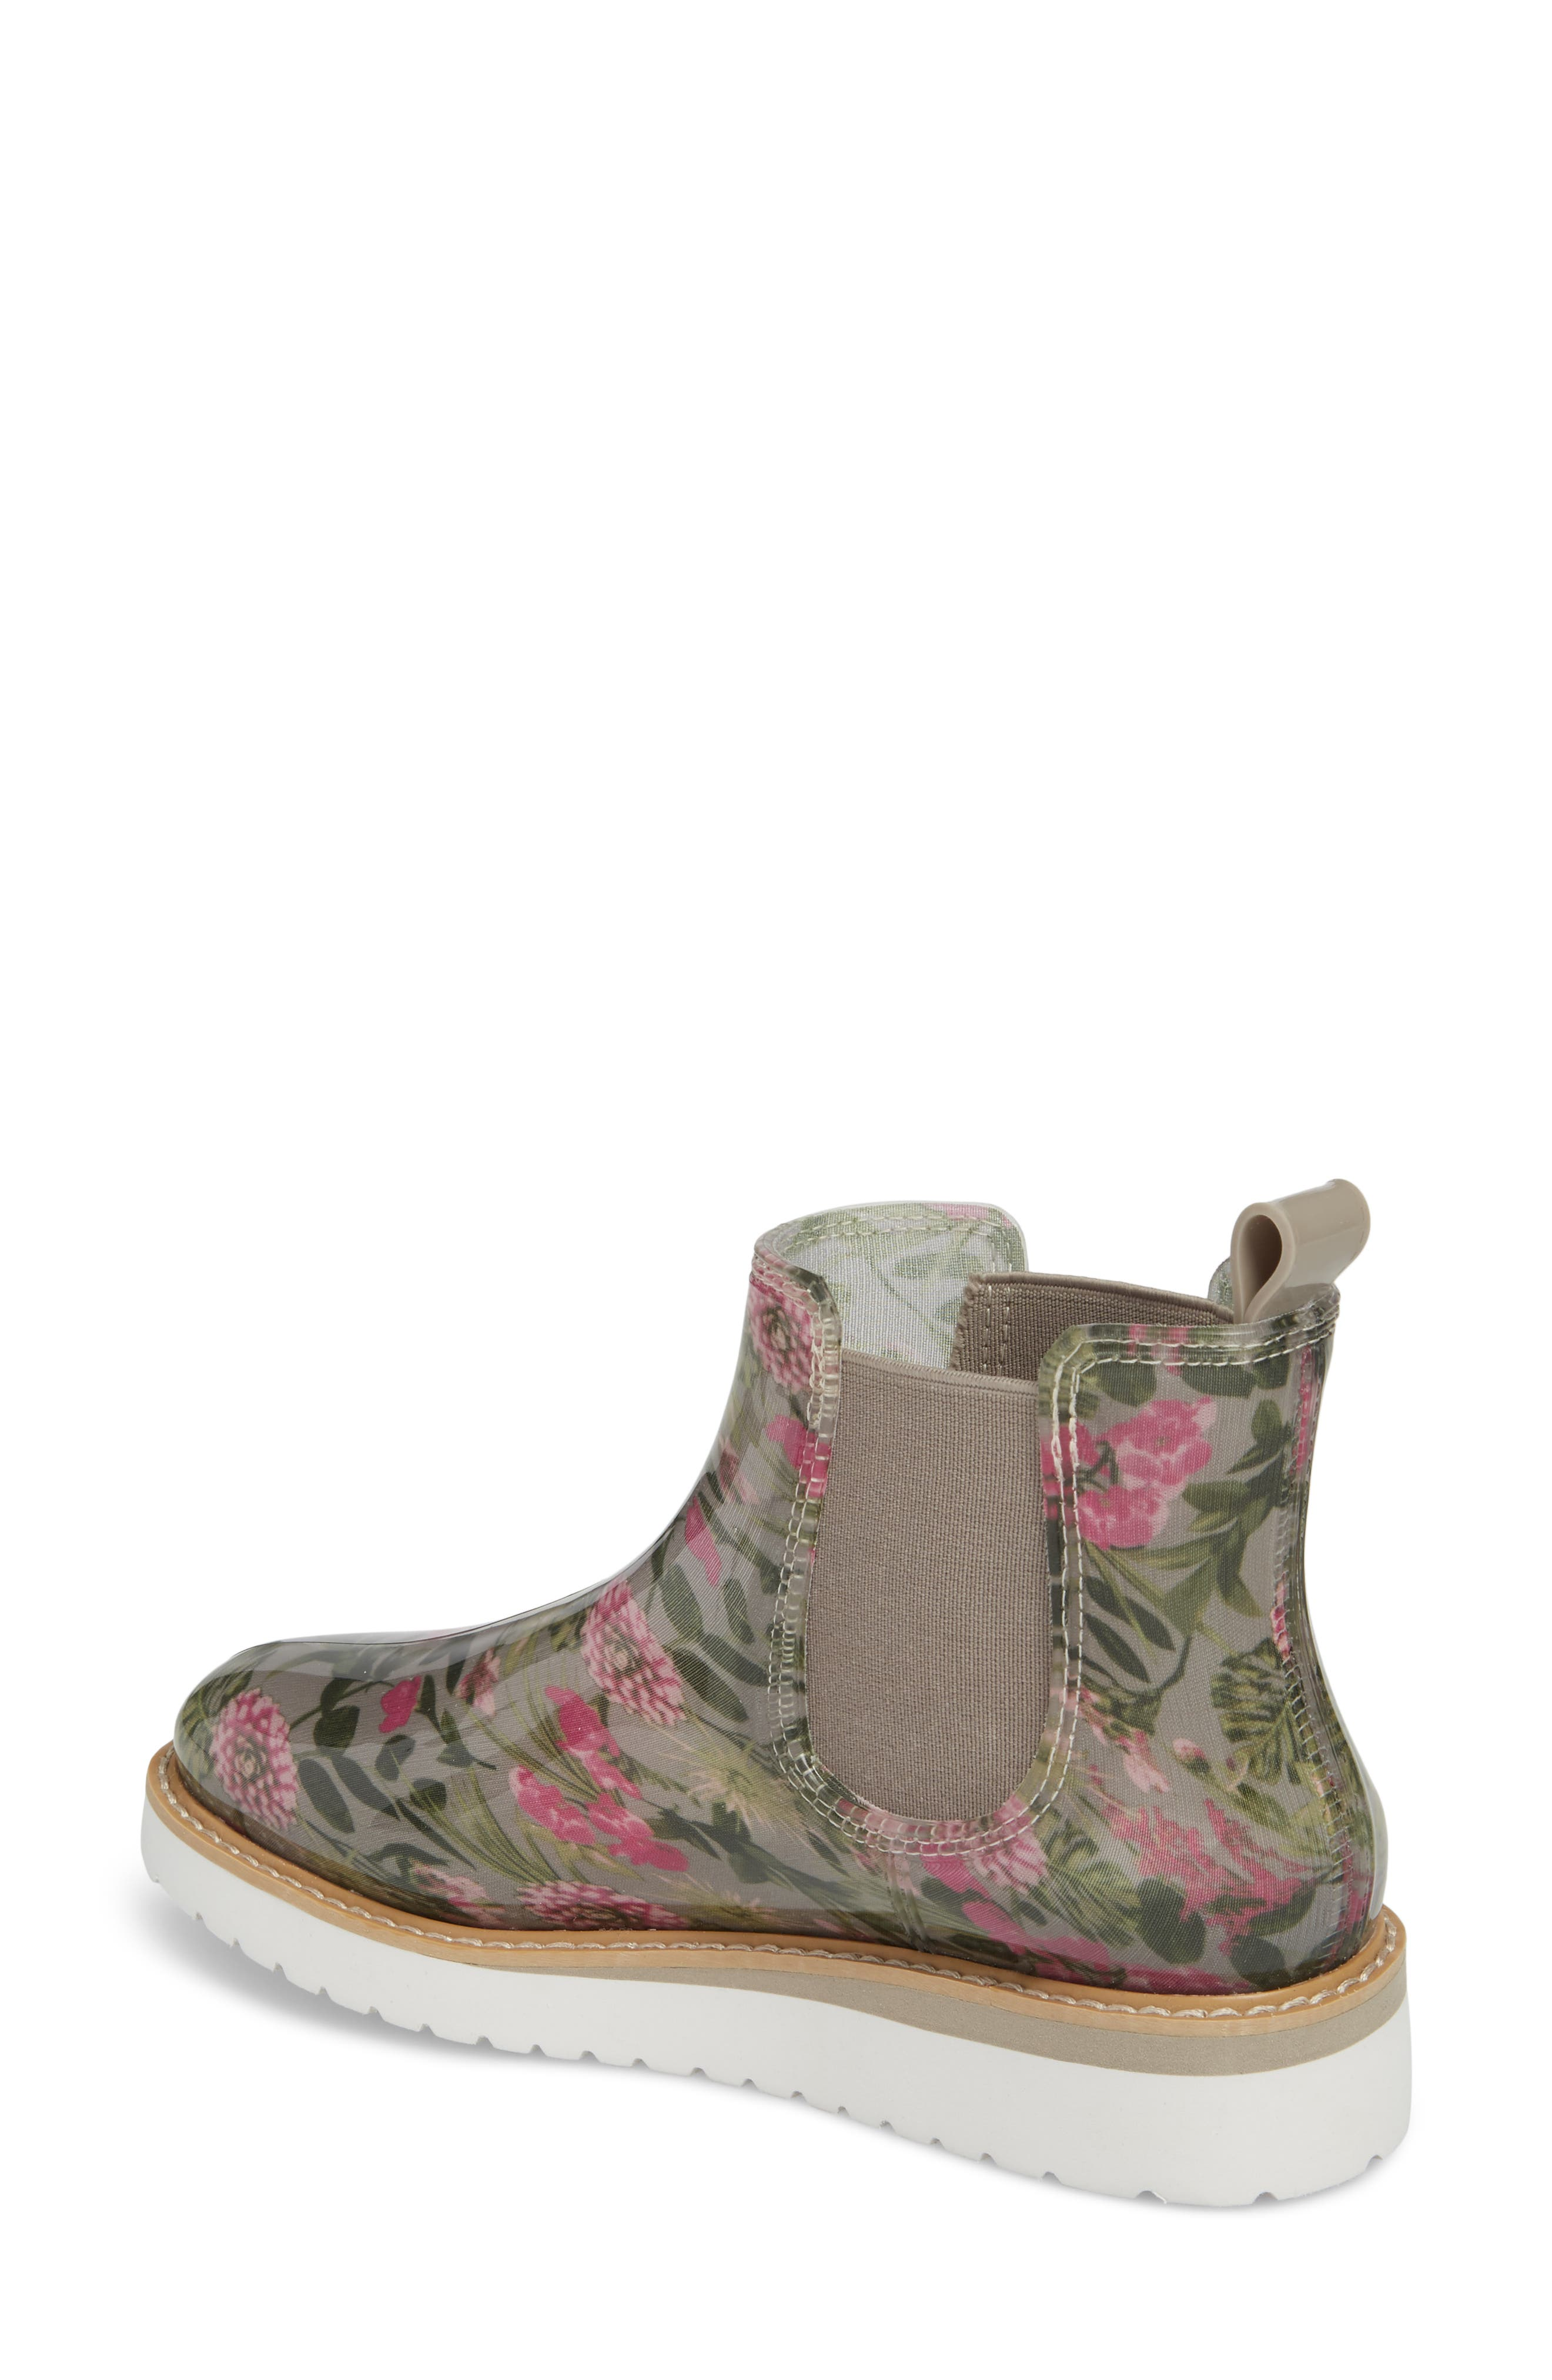 Kensington Chelsea Rain Boot,                             Alternate thumbnail 2, color,                             Tropical Floral